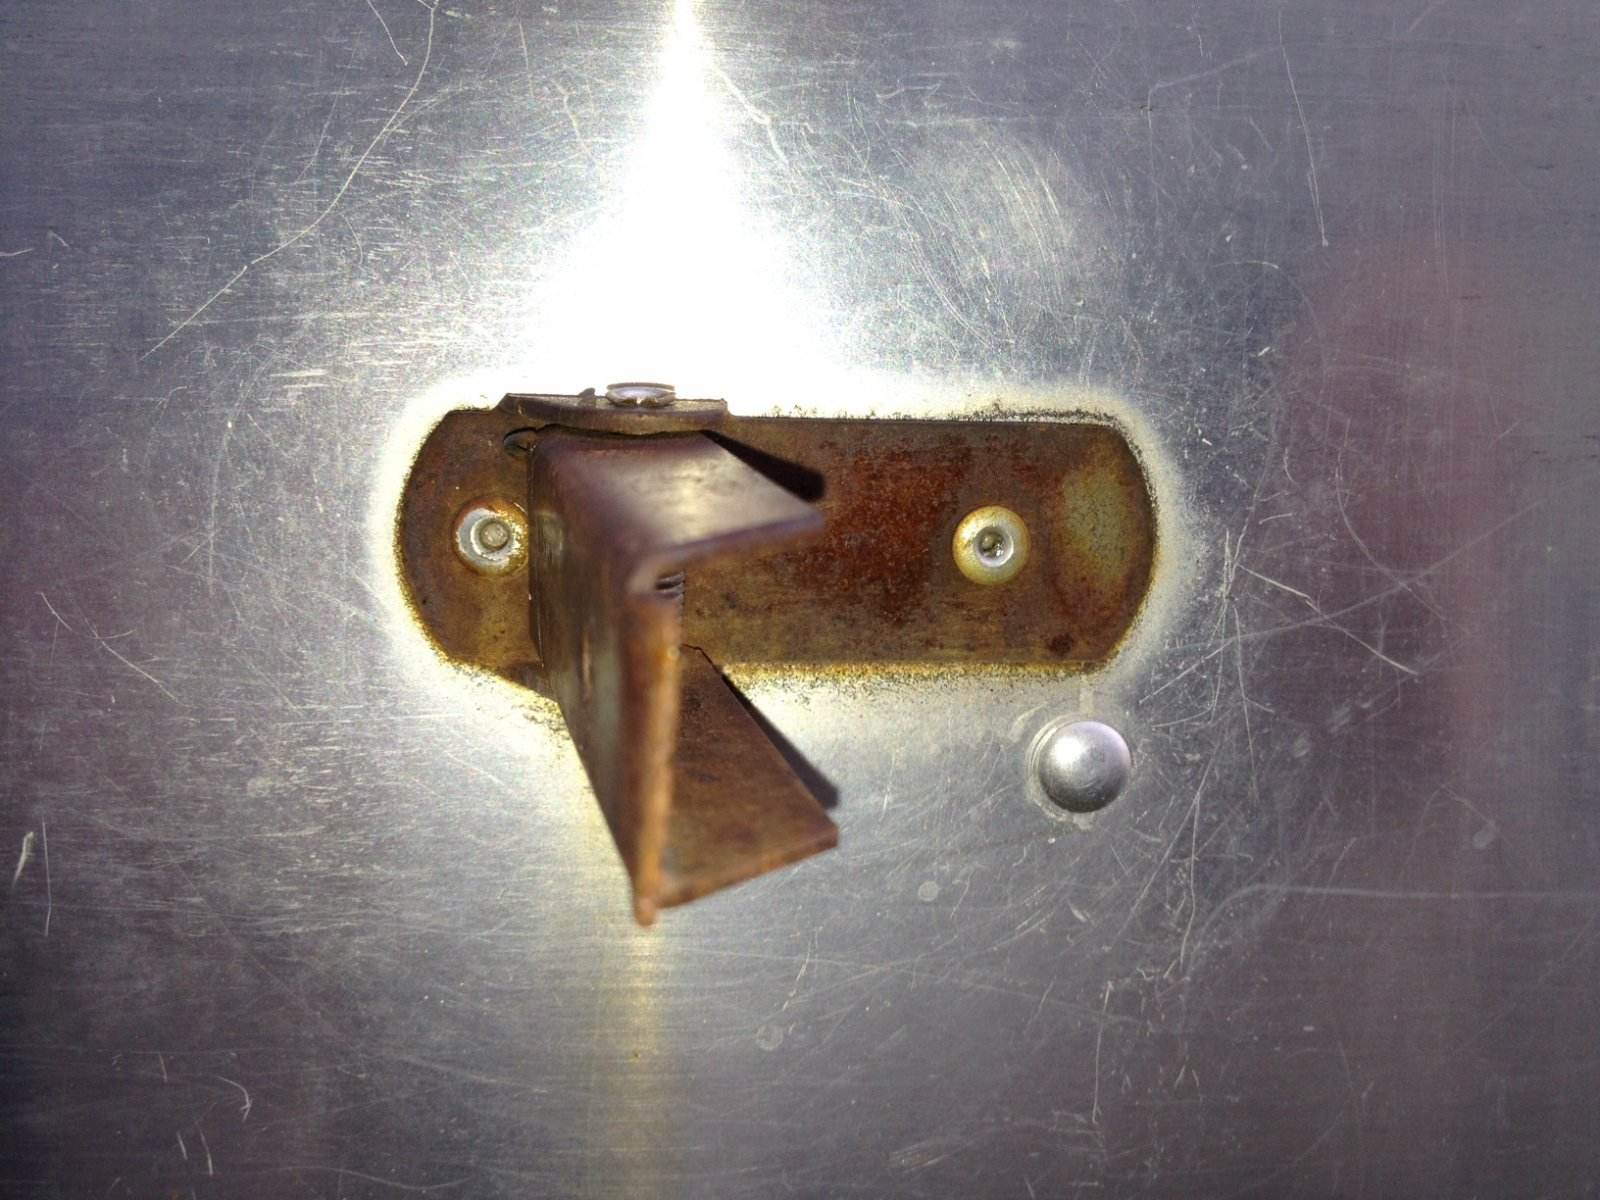 Click image for larger version  Name:door catch rivet.jpg Views:90 Size:313.2 KB ID:164285